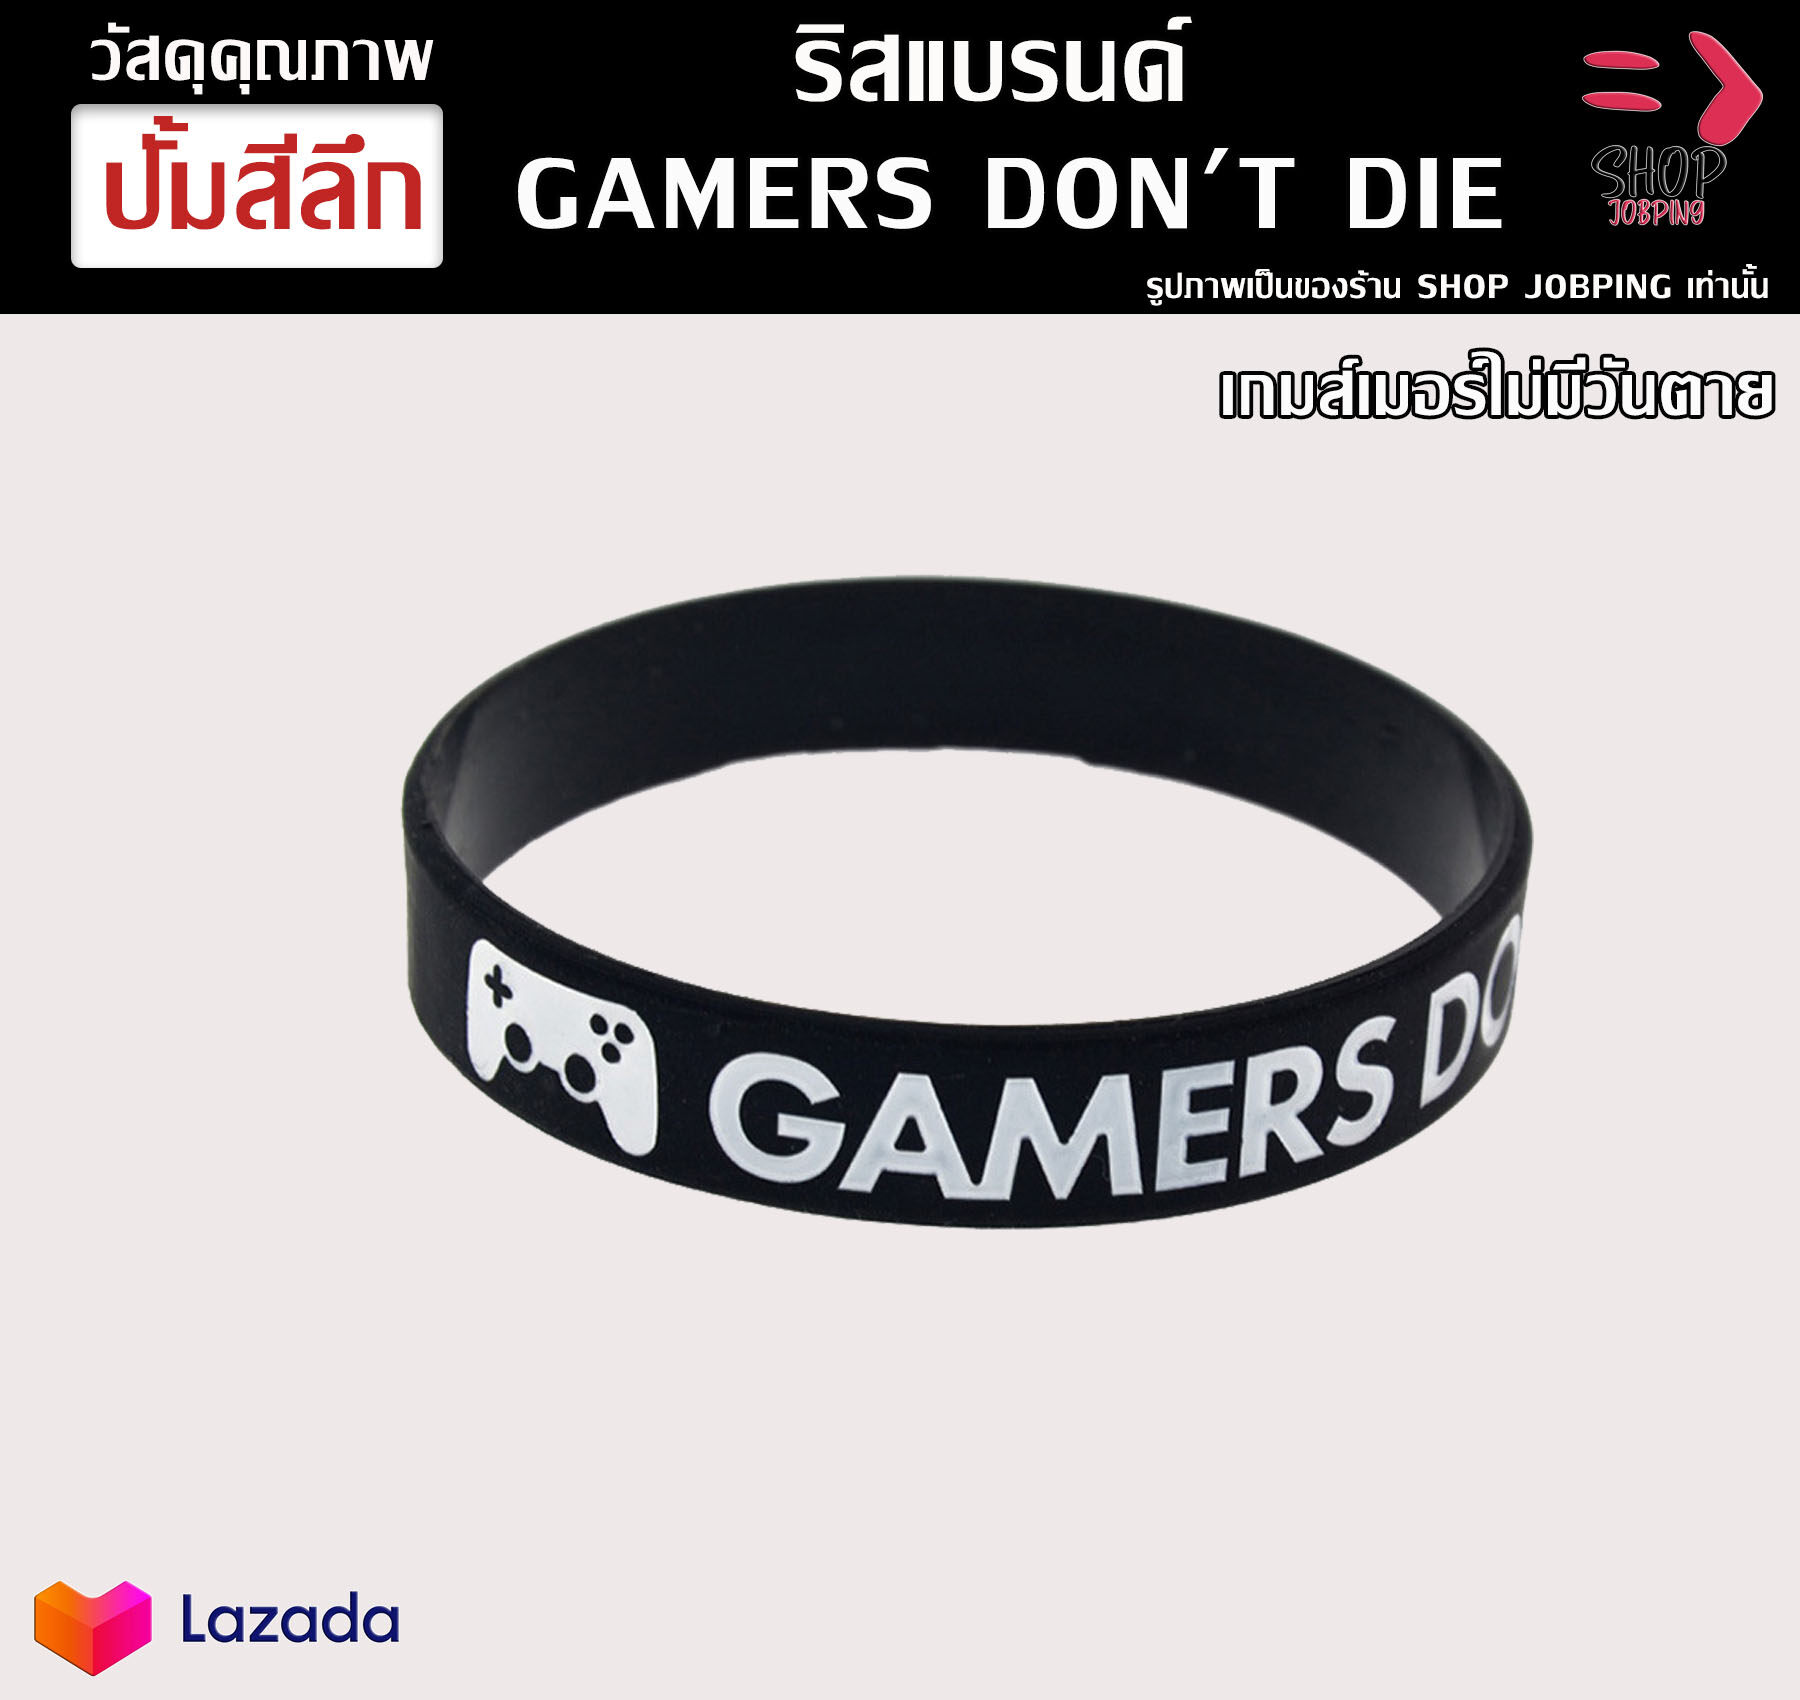 Gamers Dont Die ริสแบนด์ เกมส์เมอร์ไม่มีวันตาย ปั๊มลึกสีคมชัด Wristband ริสแบนด์สำหรับเกมส์เมอร์ ริสแบนด์สำหรับคนชอบเล่นเกมส์.